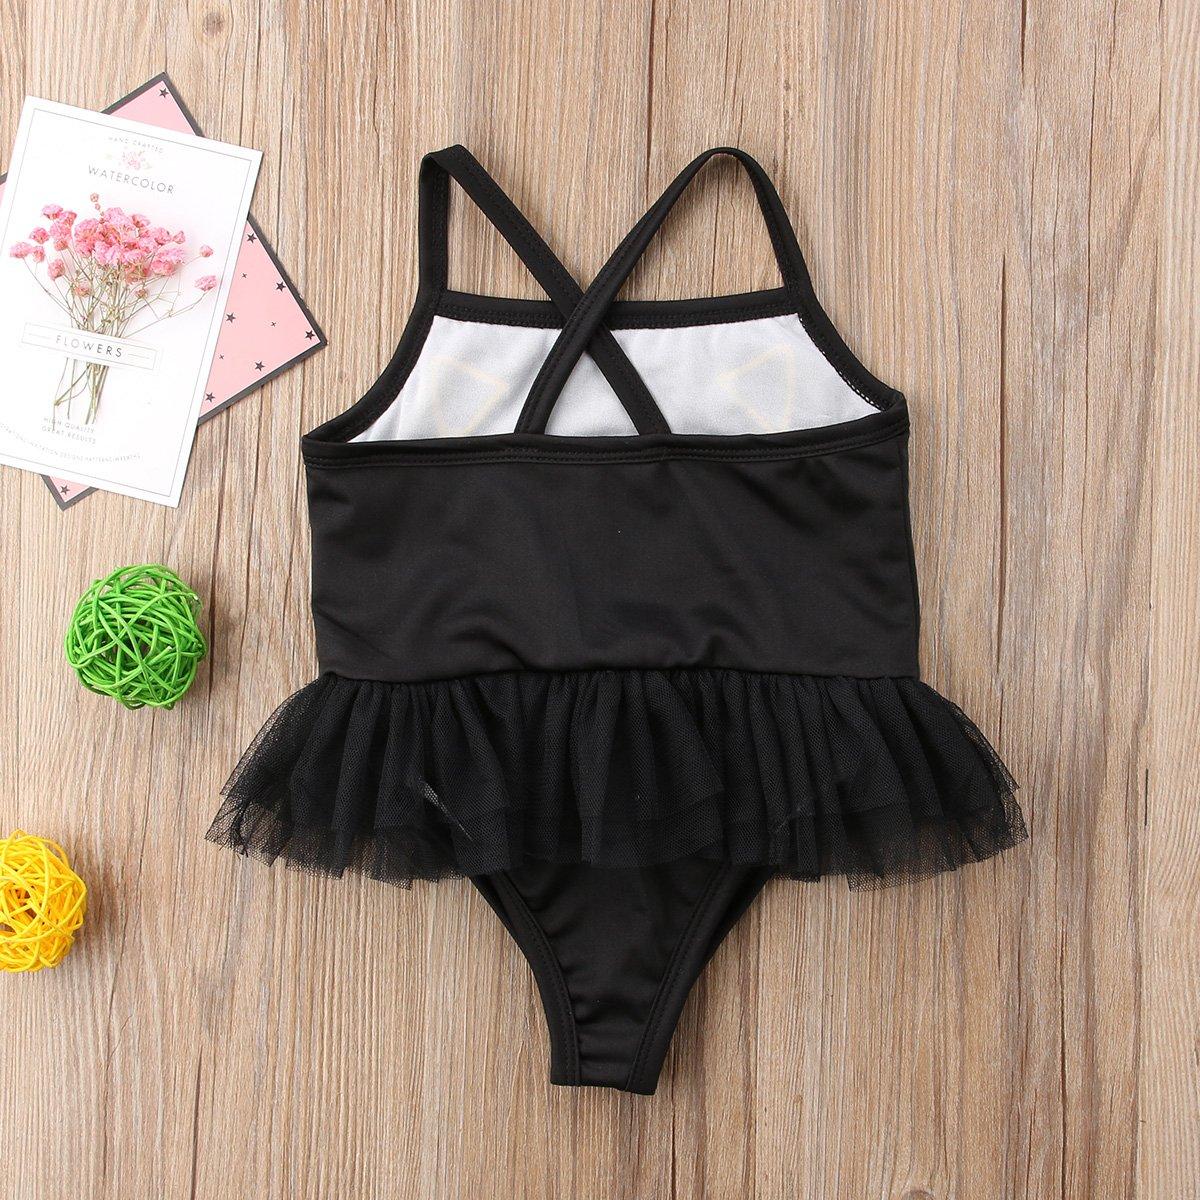 24ad42641b Amazon.com: Kid Toddler Baby Girls Bathing Suit Cat Face One Piece Swimsuit  Swimwear: Clothing